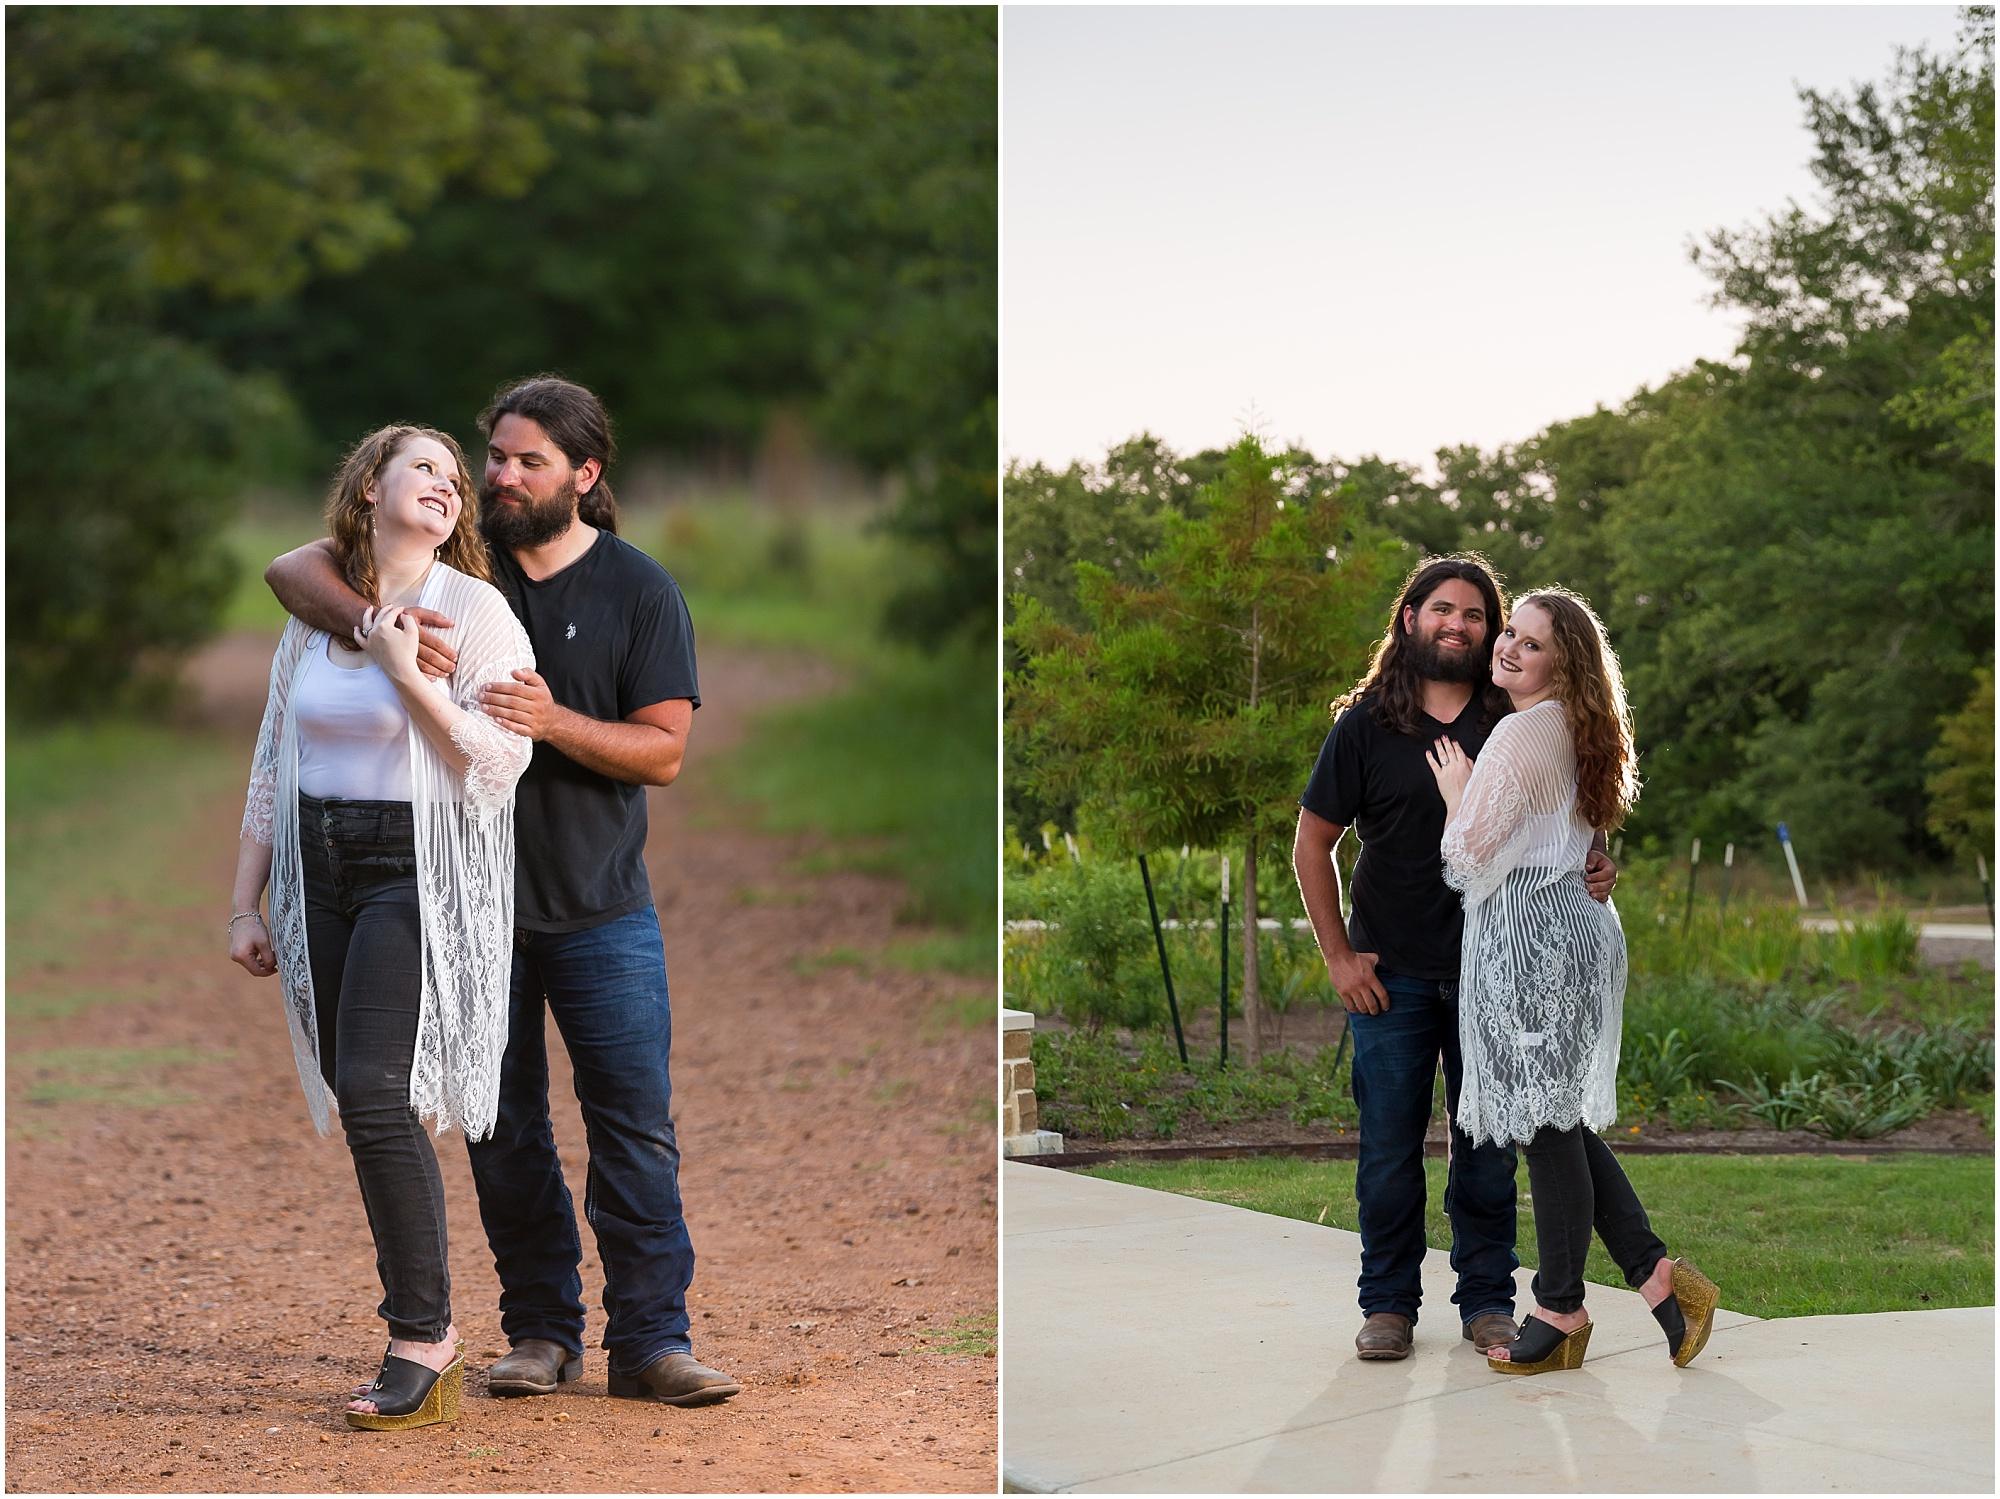 Lick Creek Park Engagement Photos, College Station - Jason & Melaina Photography - www.jasonandmelaina.com